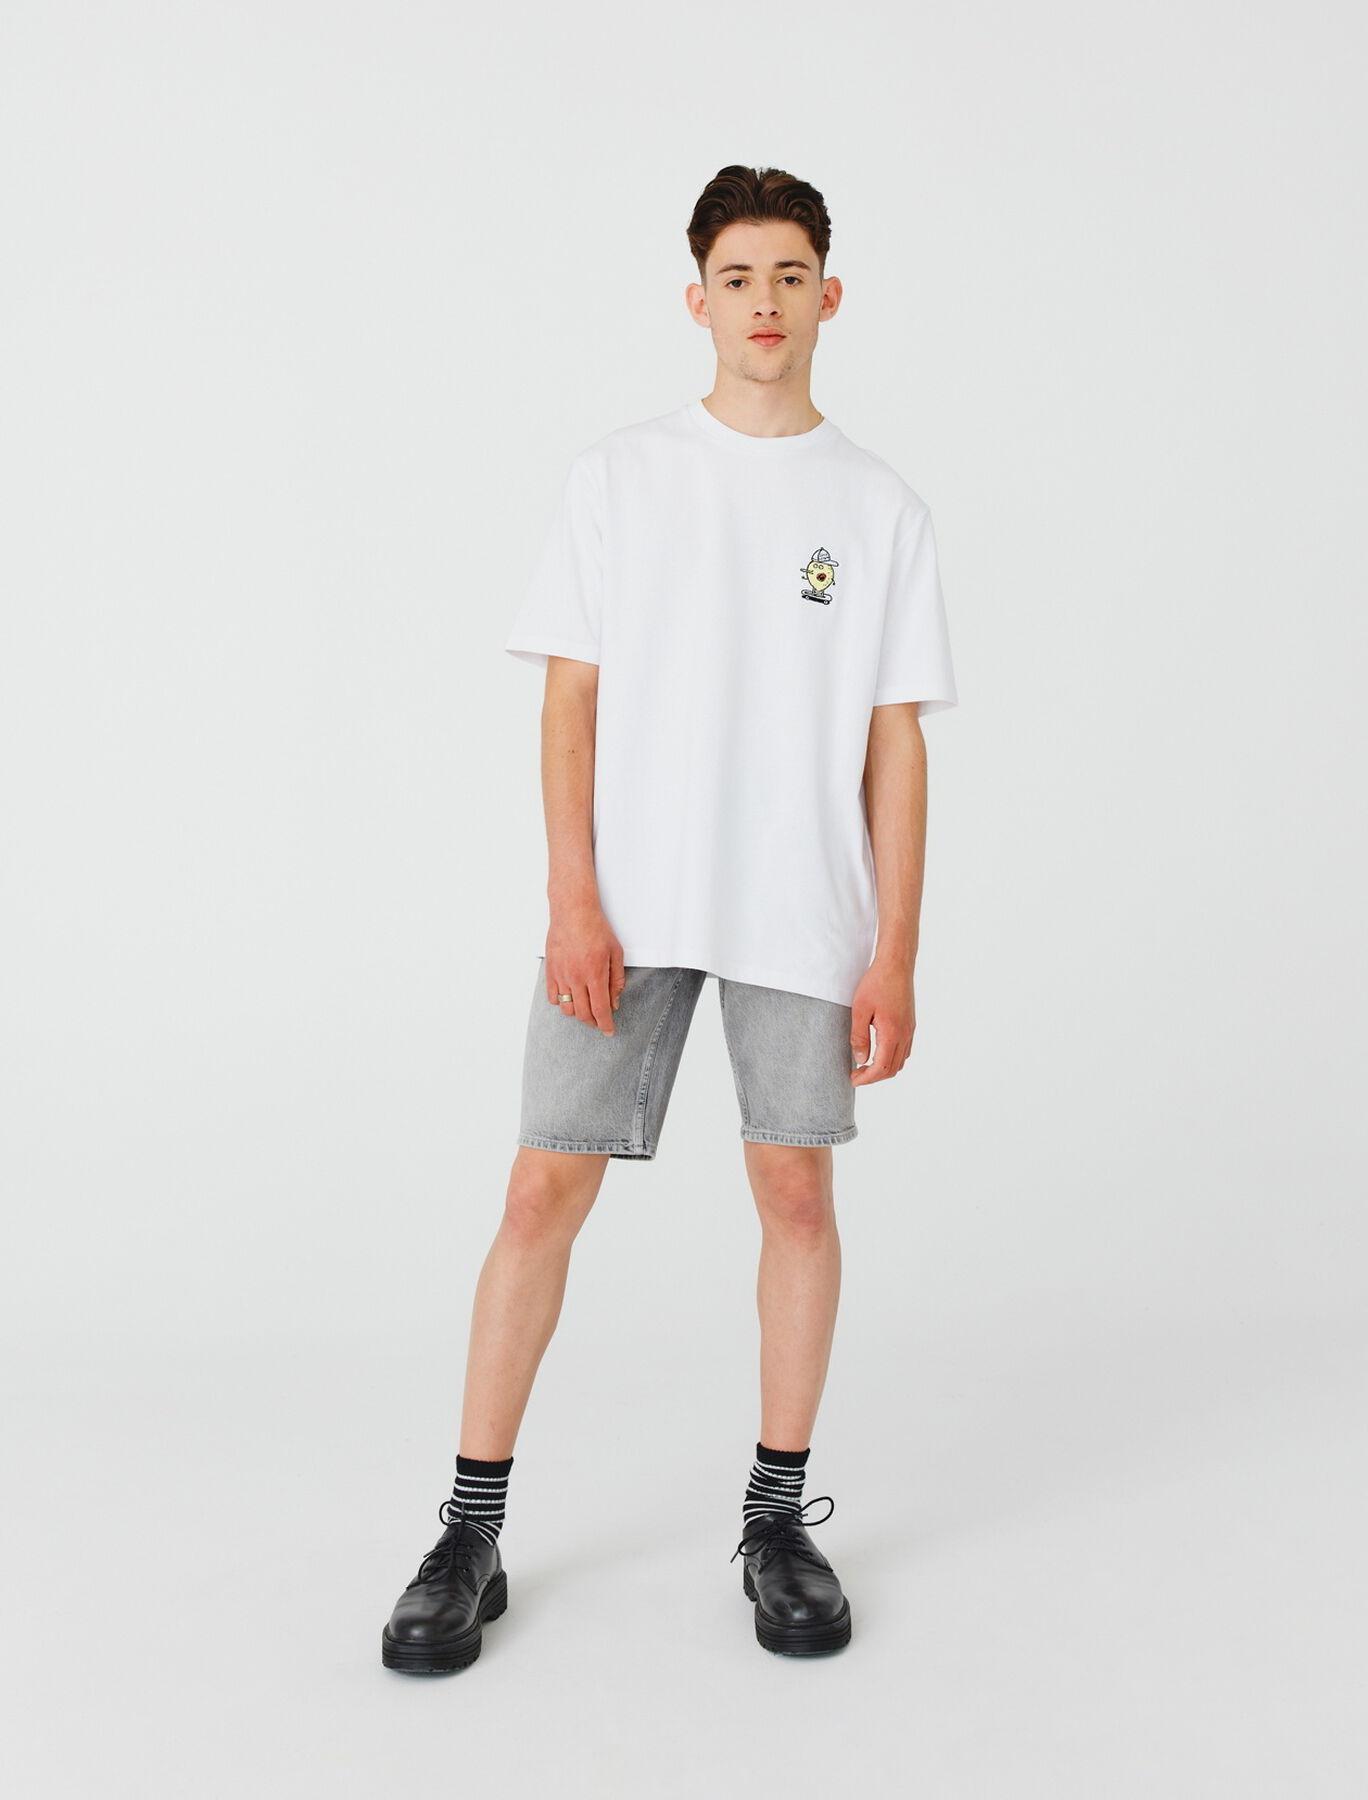 T-shirt broderie poitrine en coton BIO